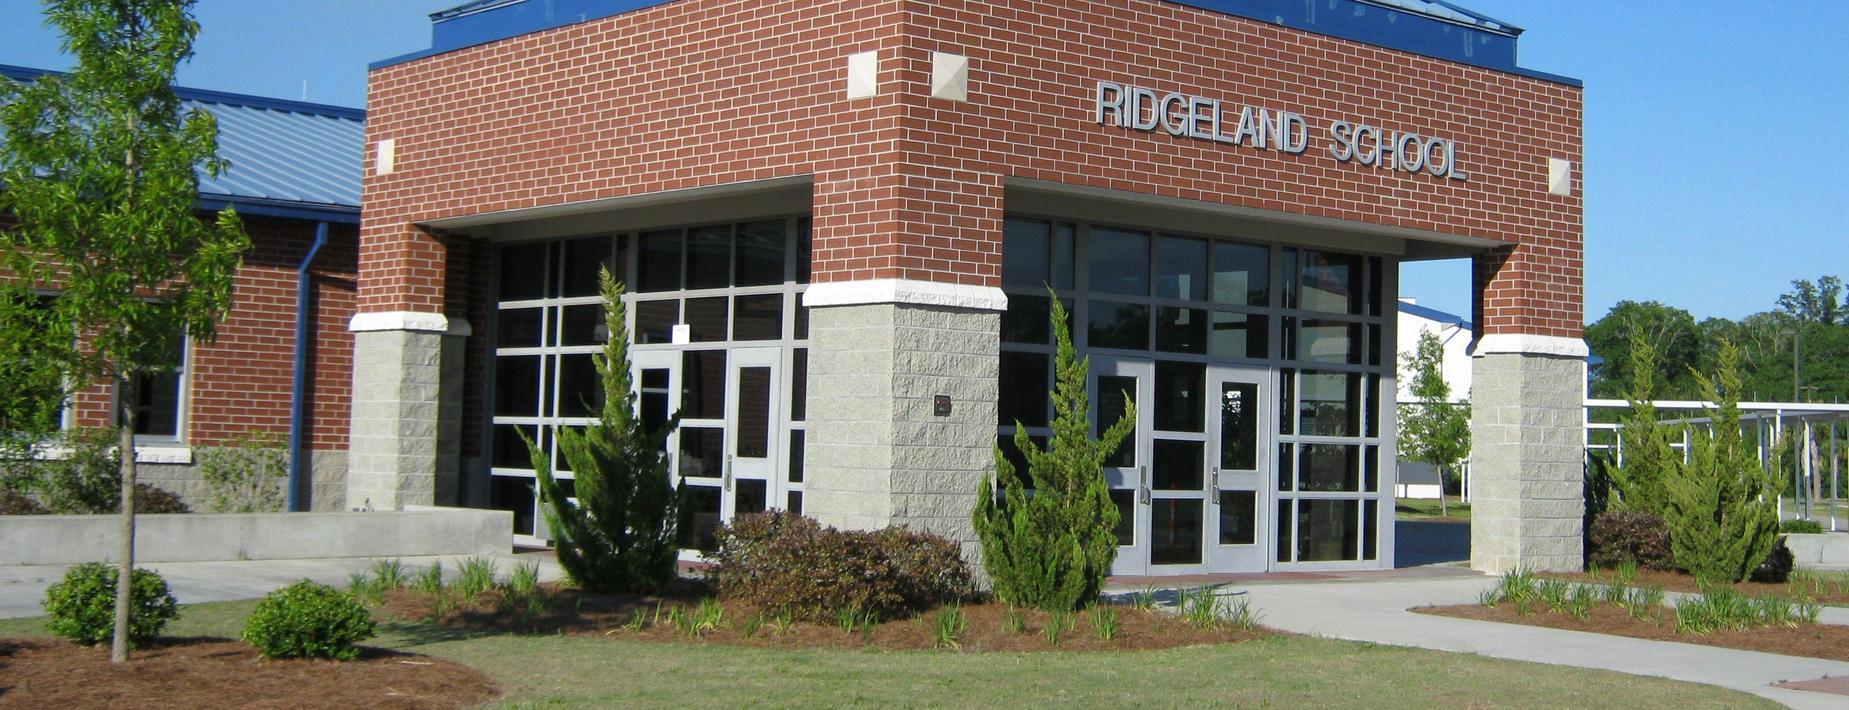 Ridgegland Campus image